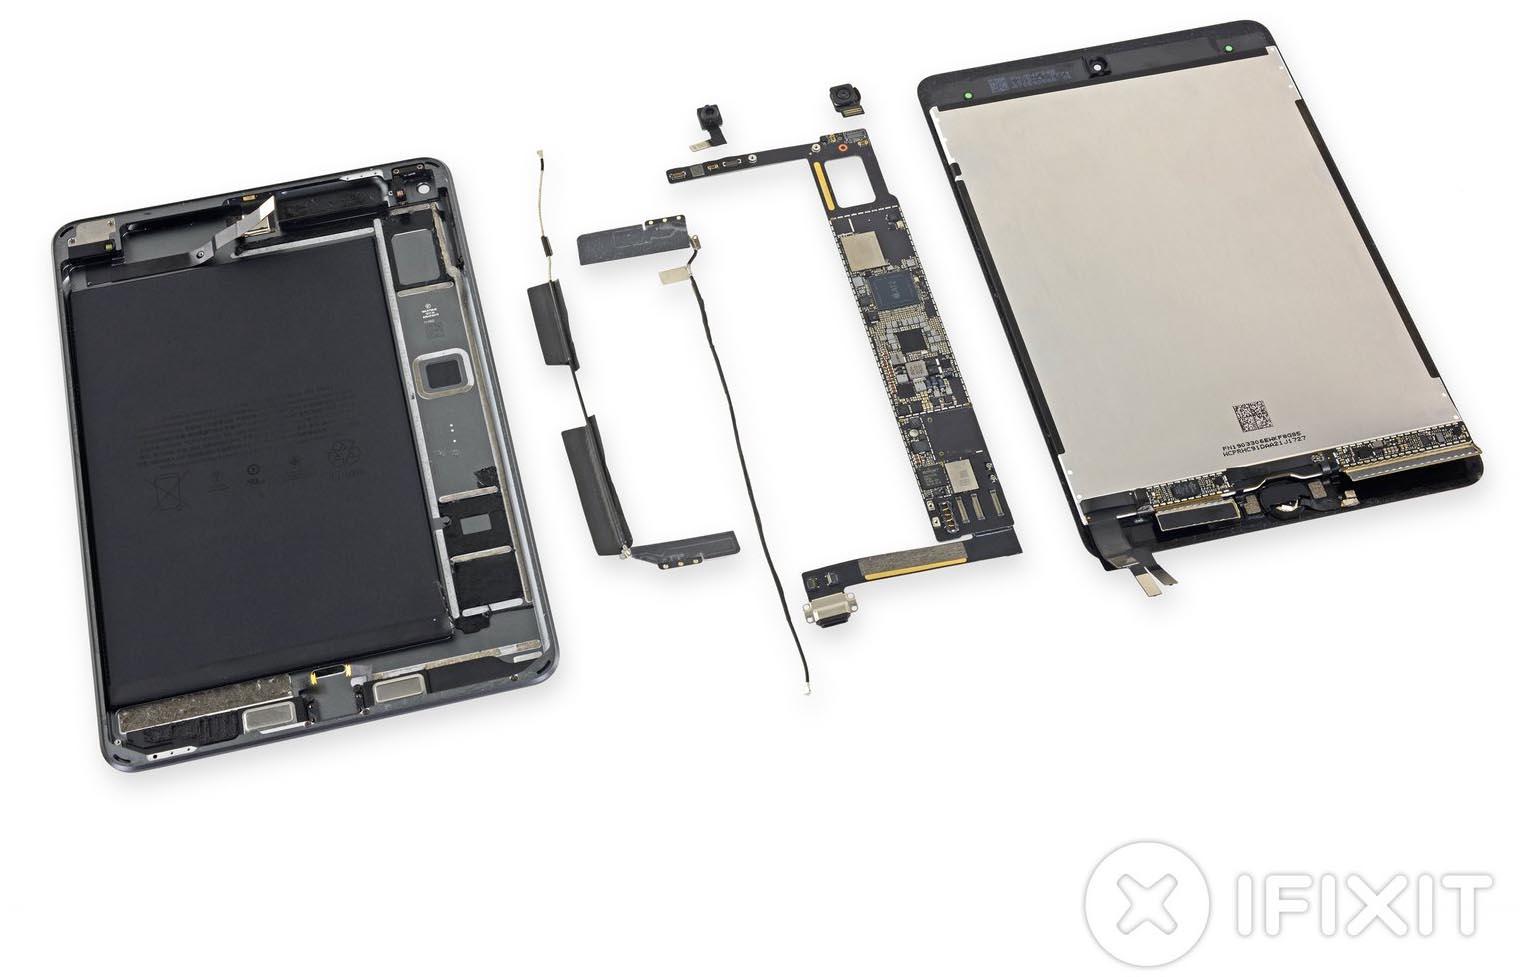 iPad mini 5 démontage iFixit